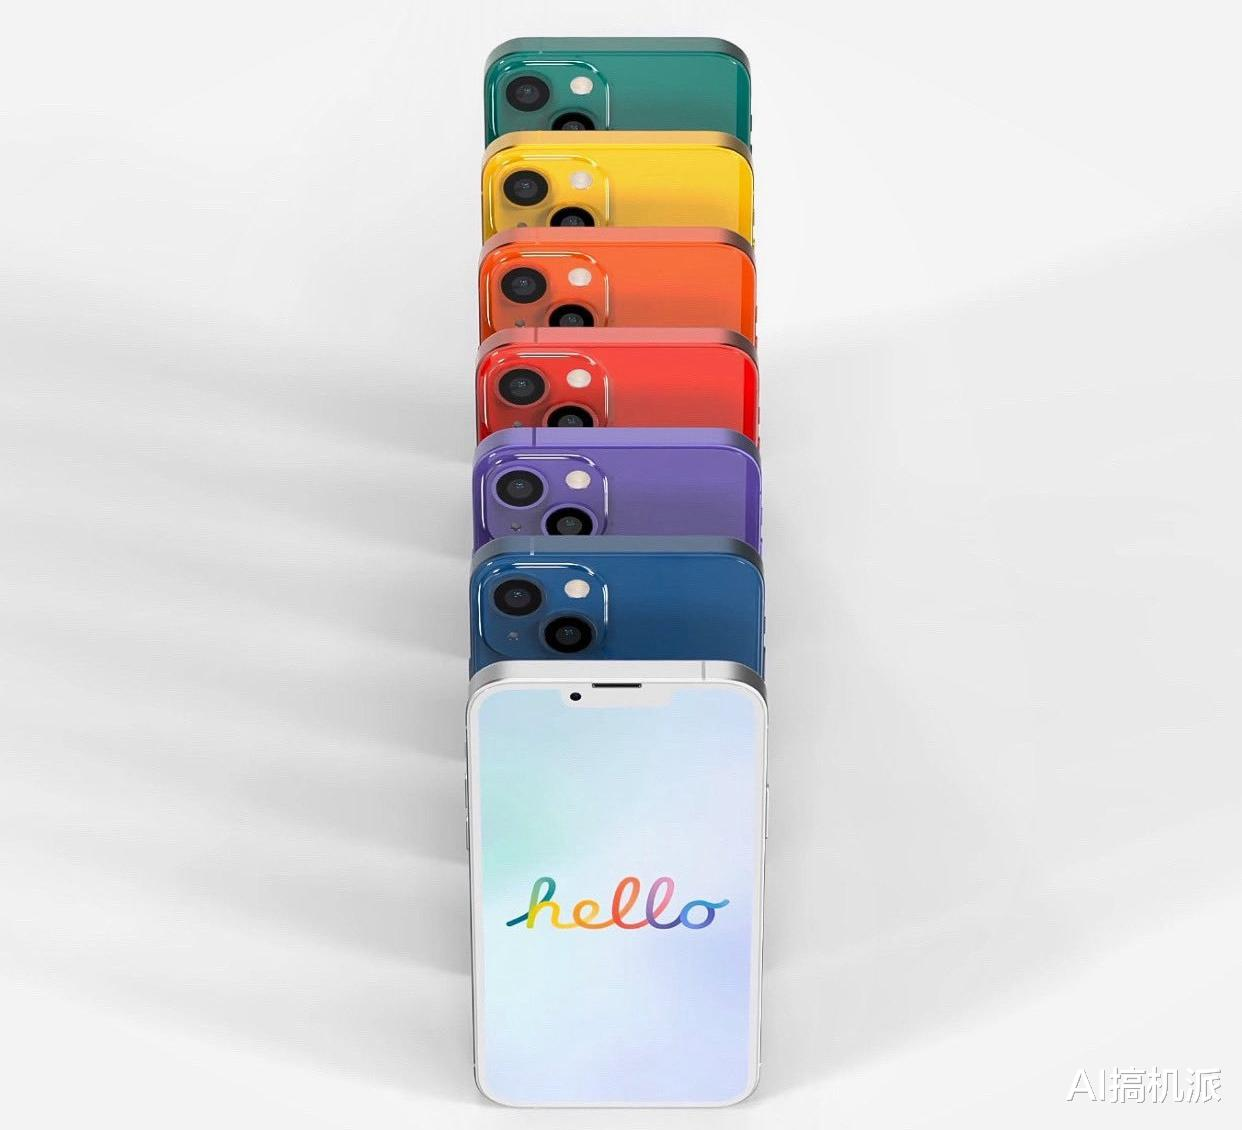 iPhone 13 Pro将升级4300mA电池,支持自适应高刷新率,很期待!